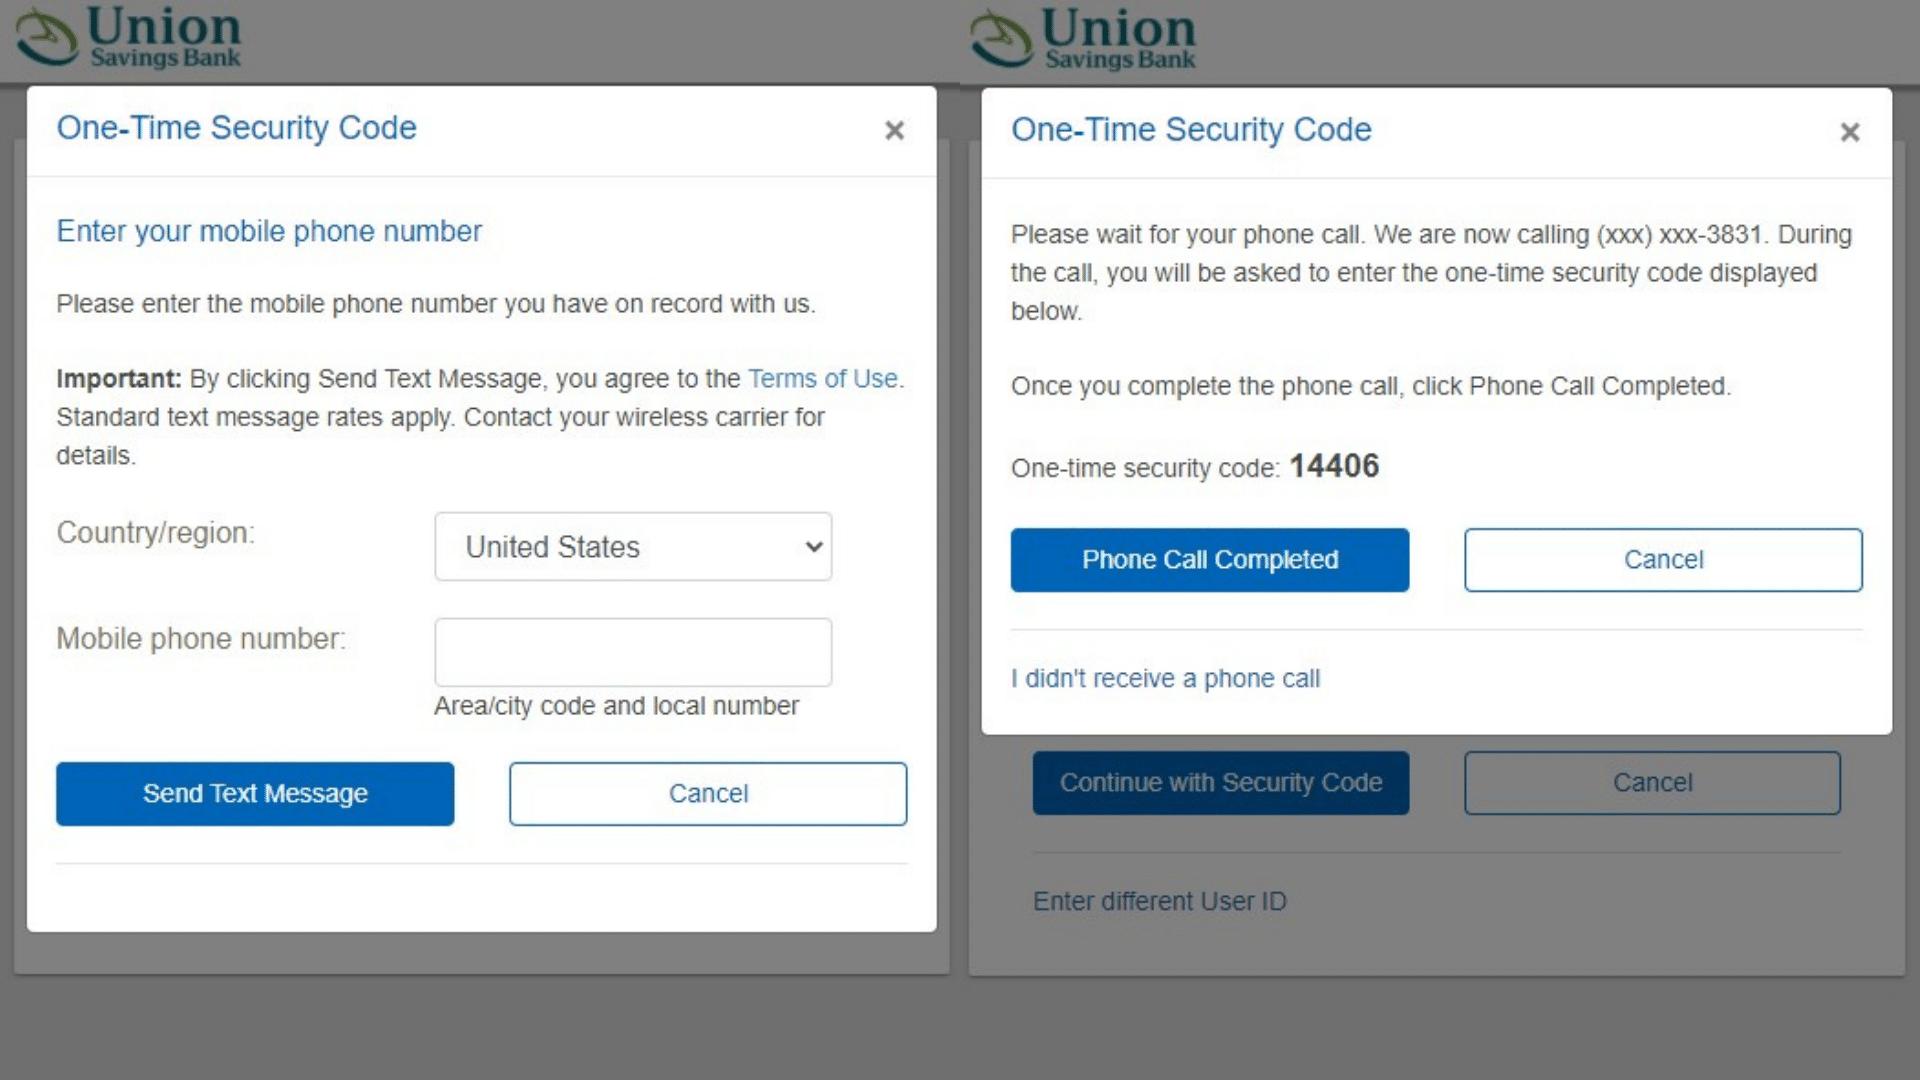 Union Savings Bank Login3